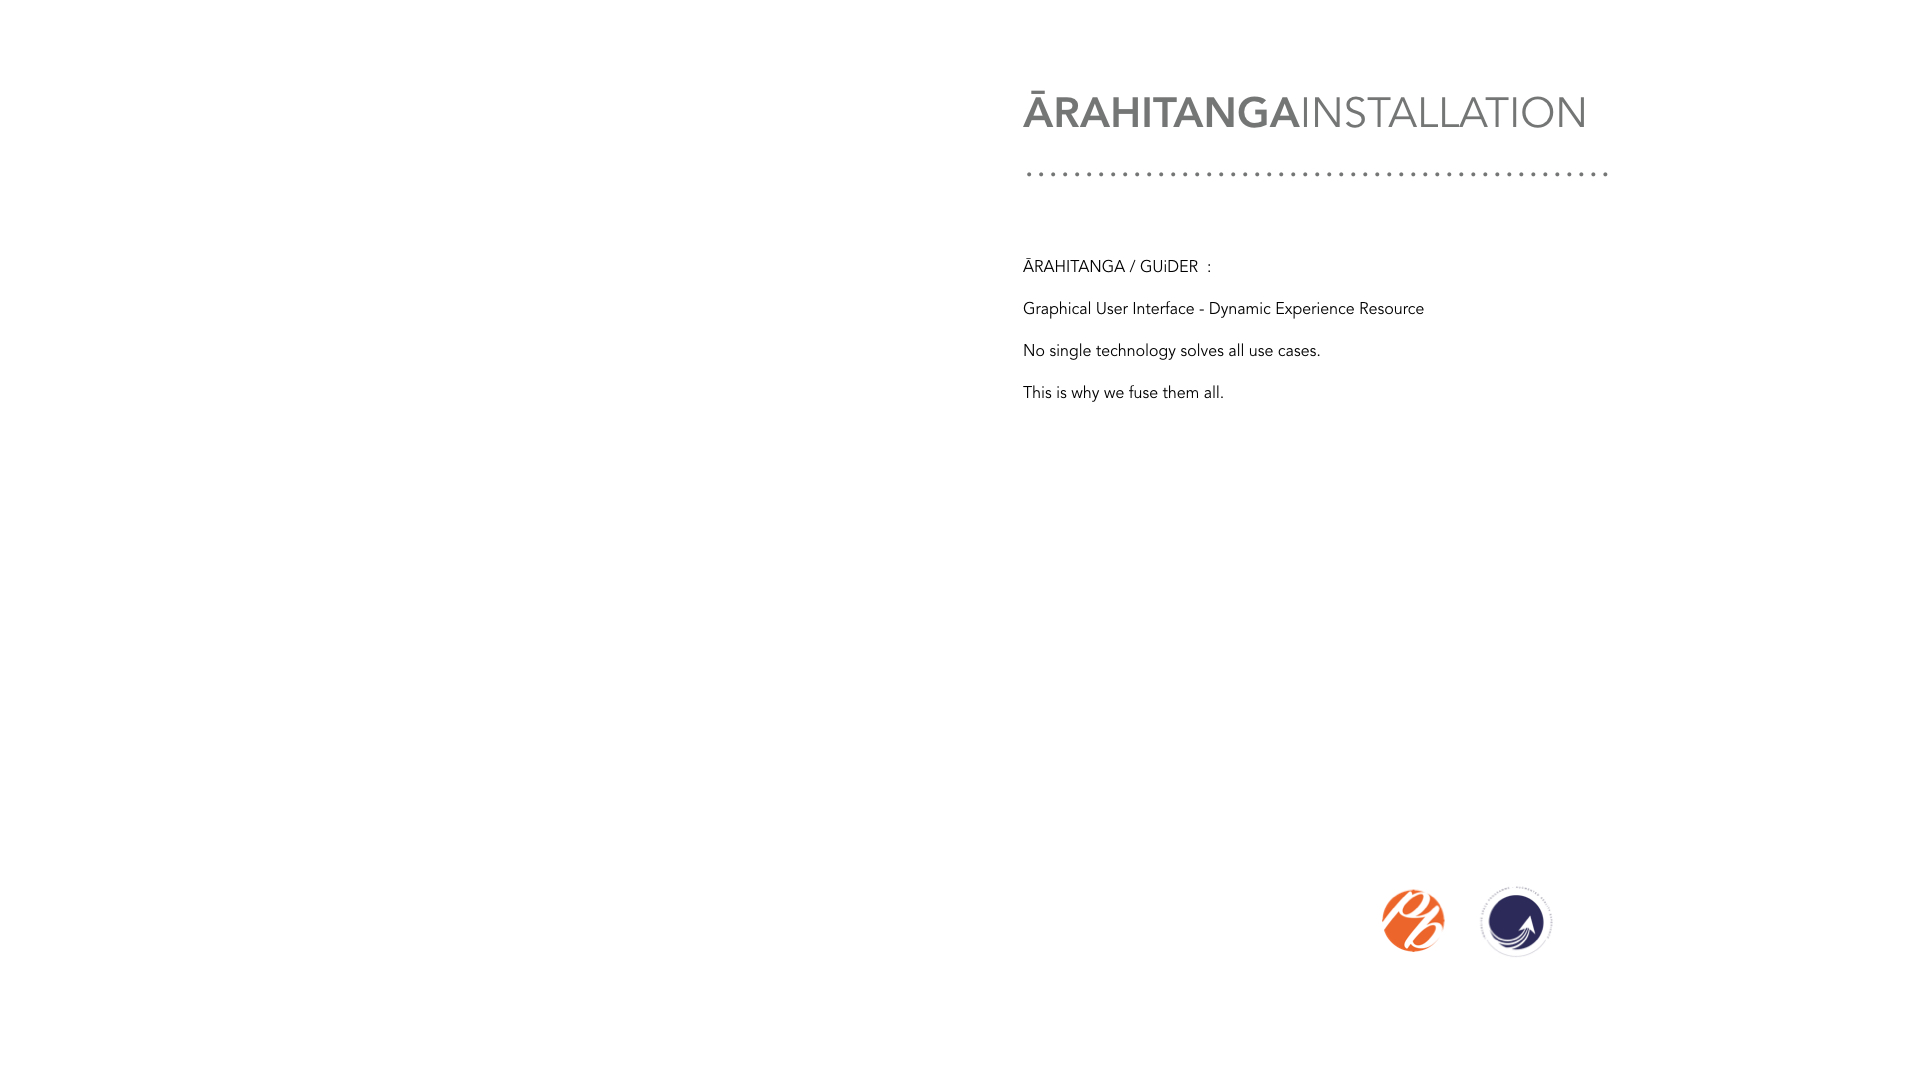 PATAKA_IPS_catalogueV1.1.002.jpeg